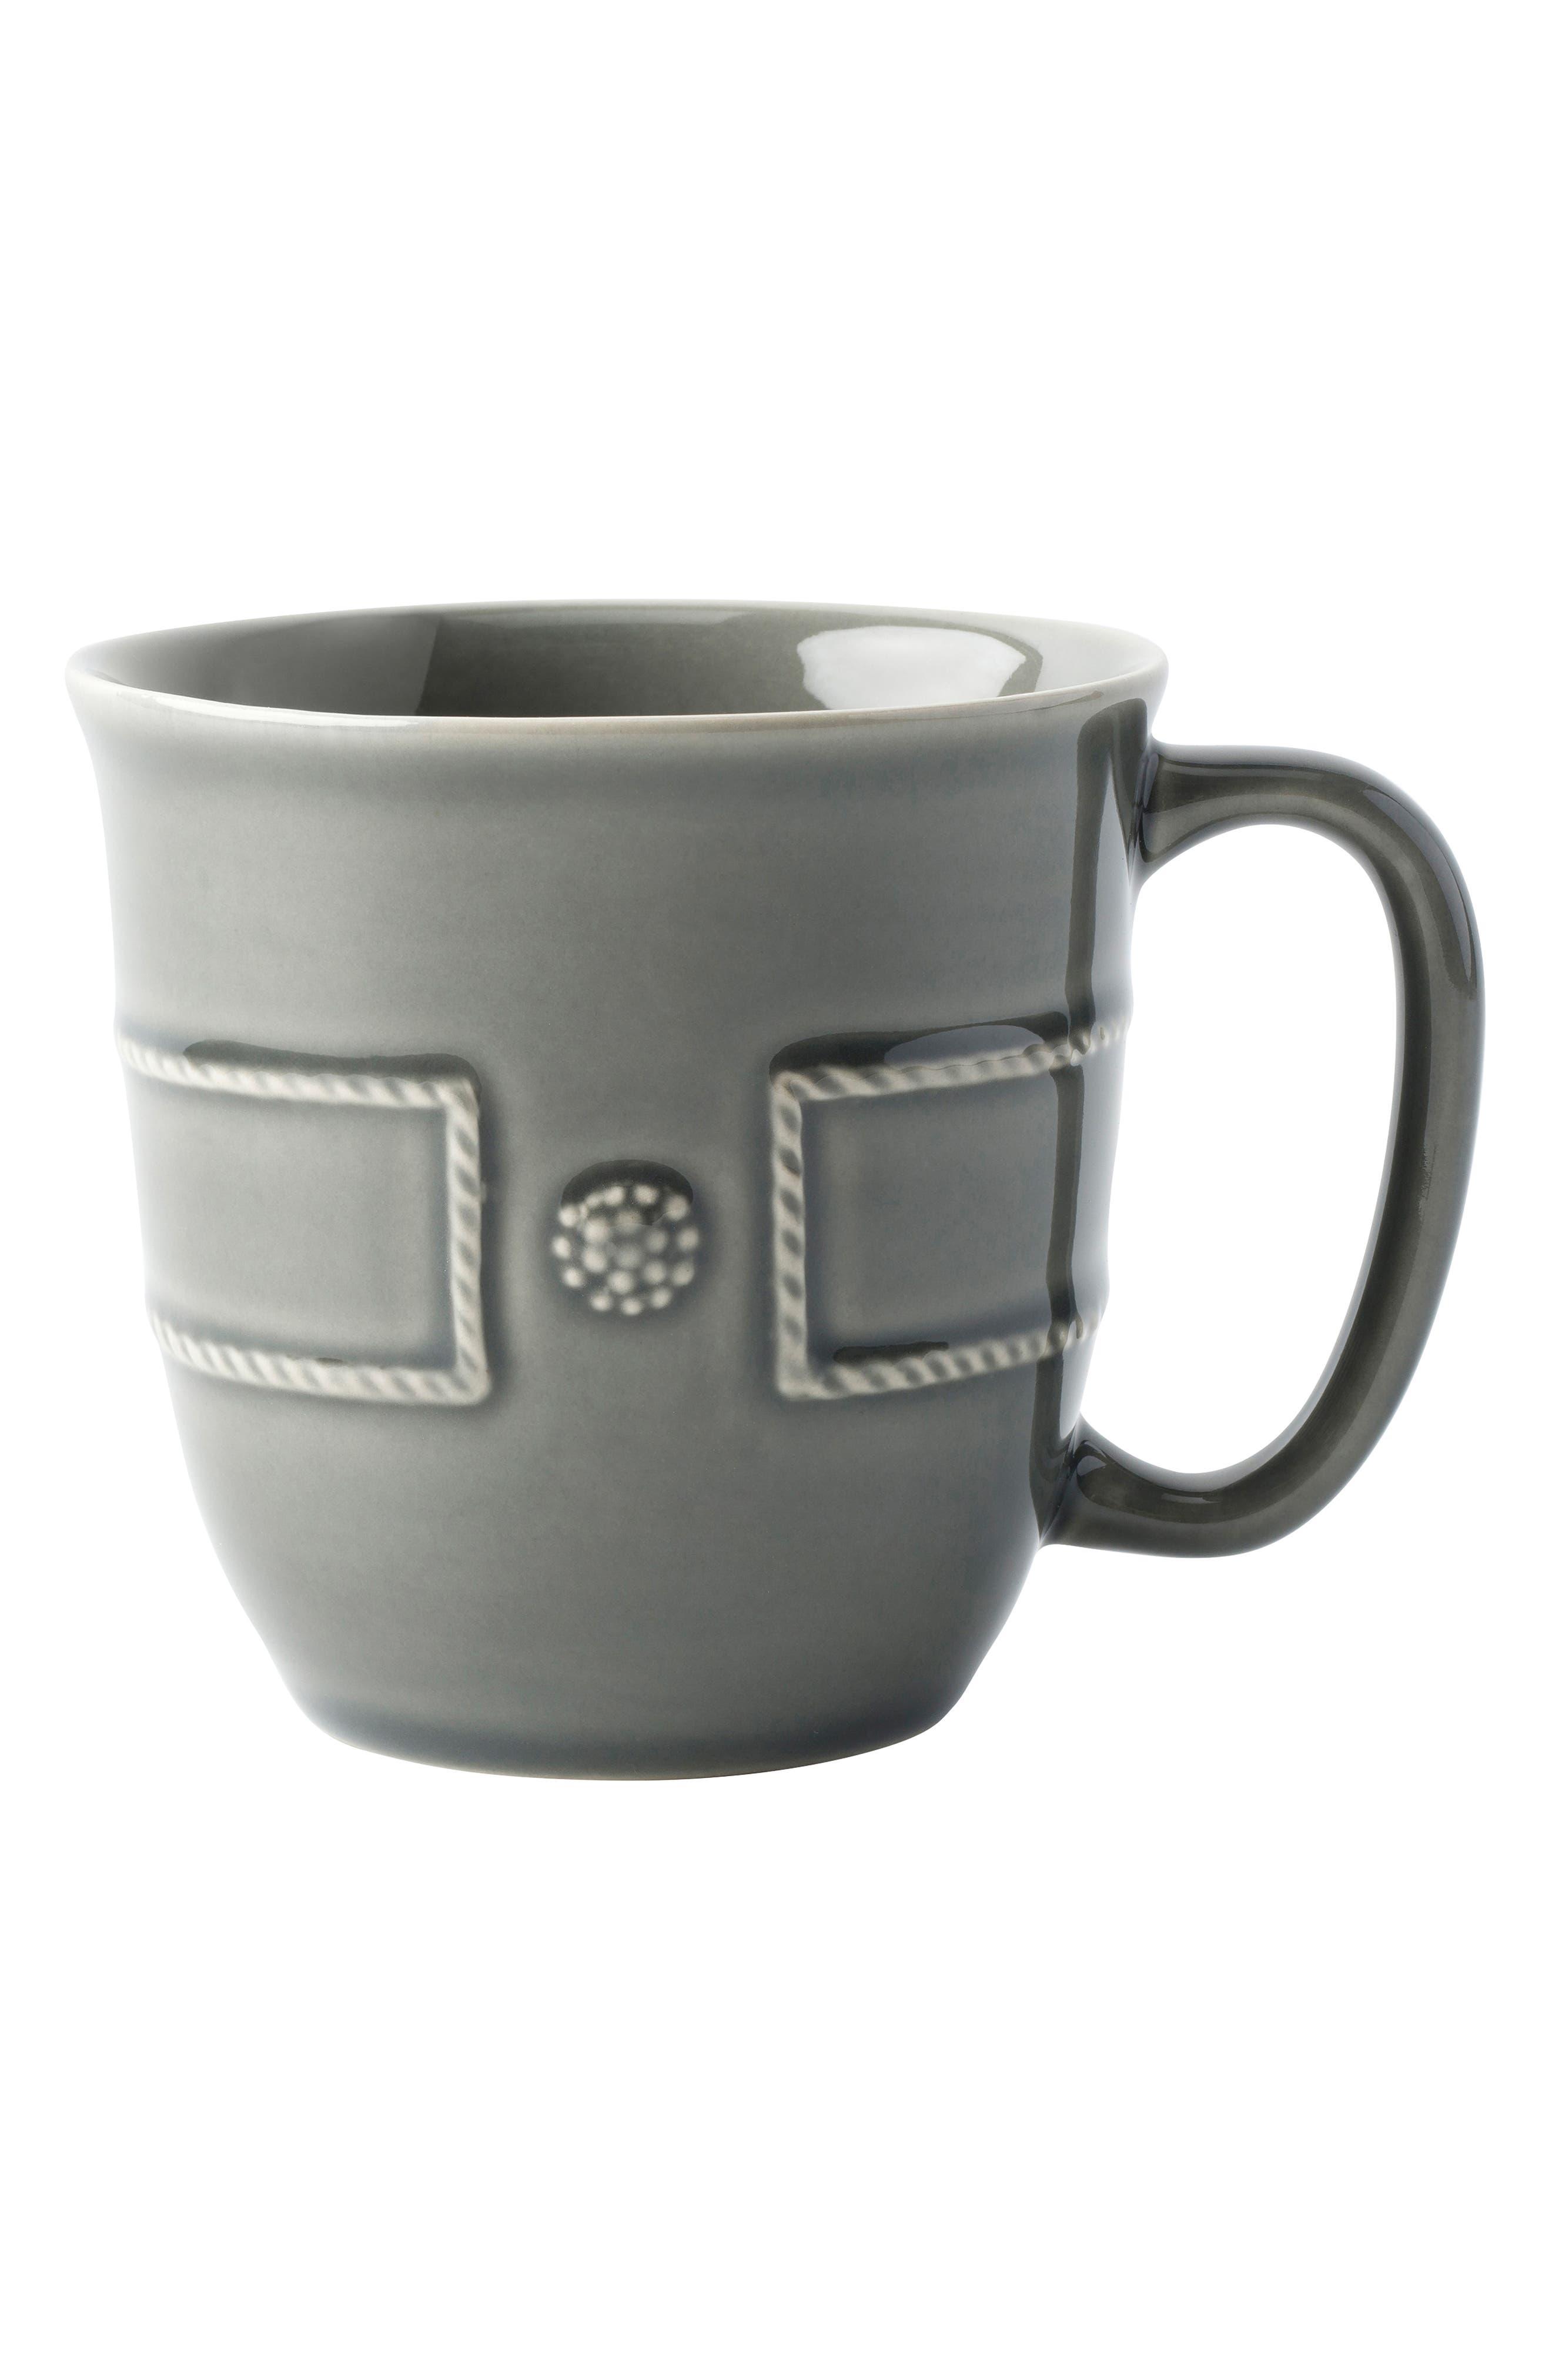 Juliska Berry u0026 Thread French Panel Mug  sc 1 st  Nordstrom & Juliska Dinnerware Glassware u0026 Tableware | Nordstrom